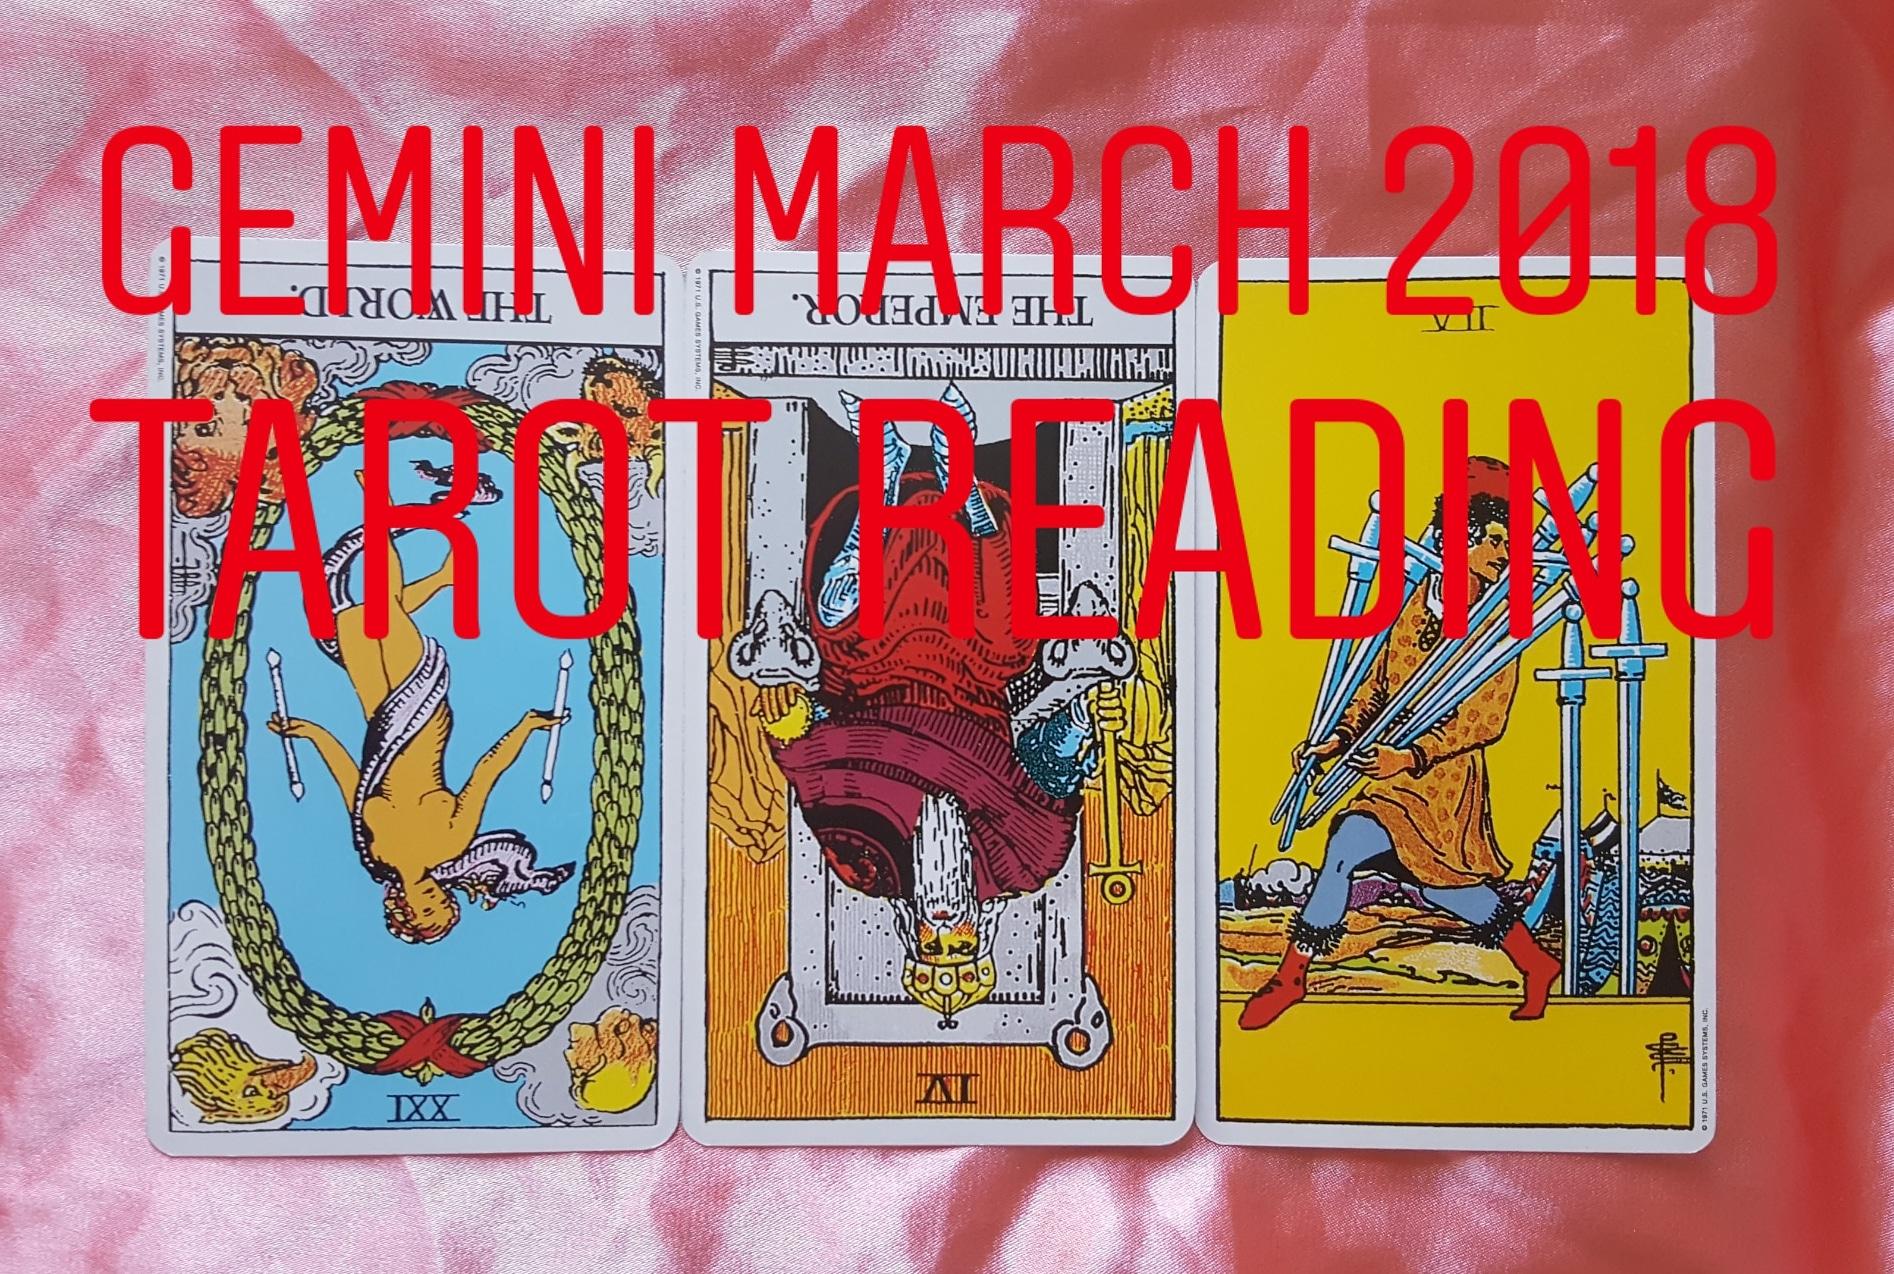 Gemini March 2018  The World reversed/ The Emperor reversed/ 7 of Swords